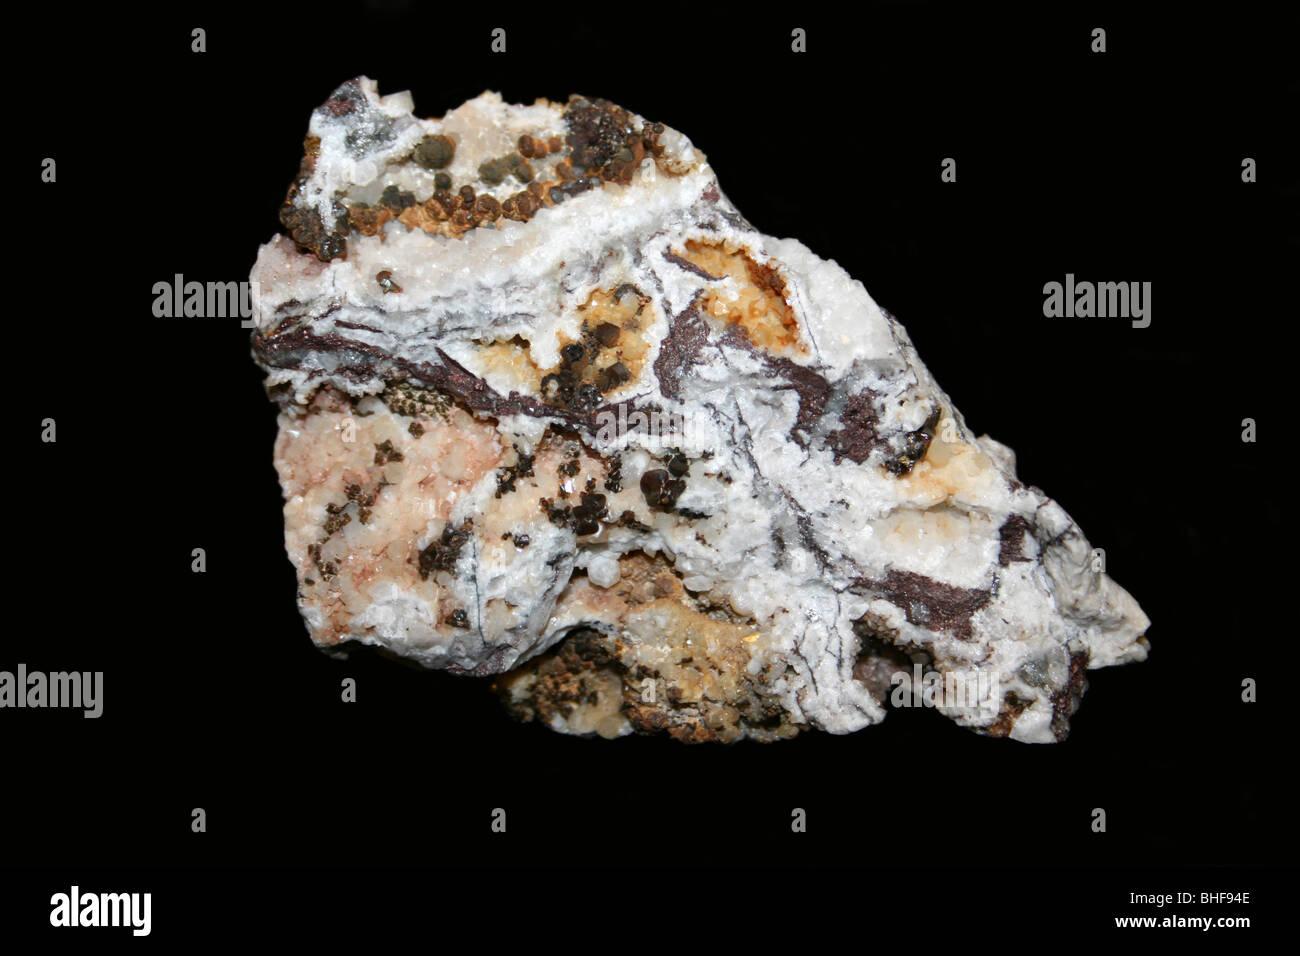 Sphalerite, Quartz & Dolomite - Stock Image